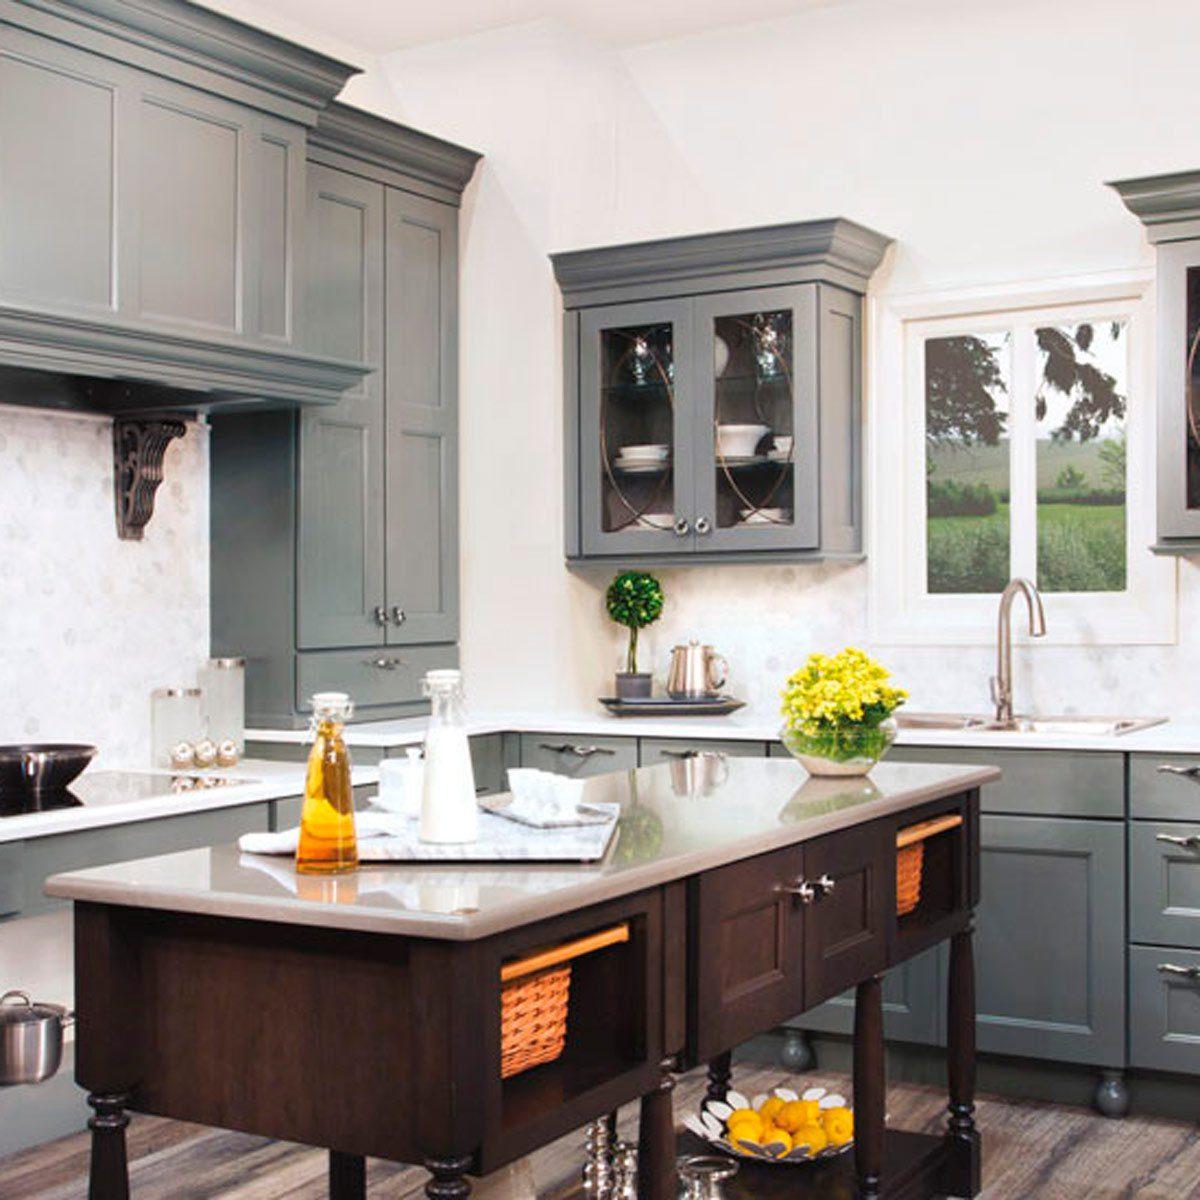 13 Stunning Dark Kitchen Cabinet Ideas | Family Handyman